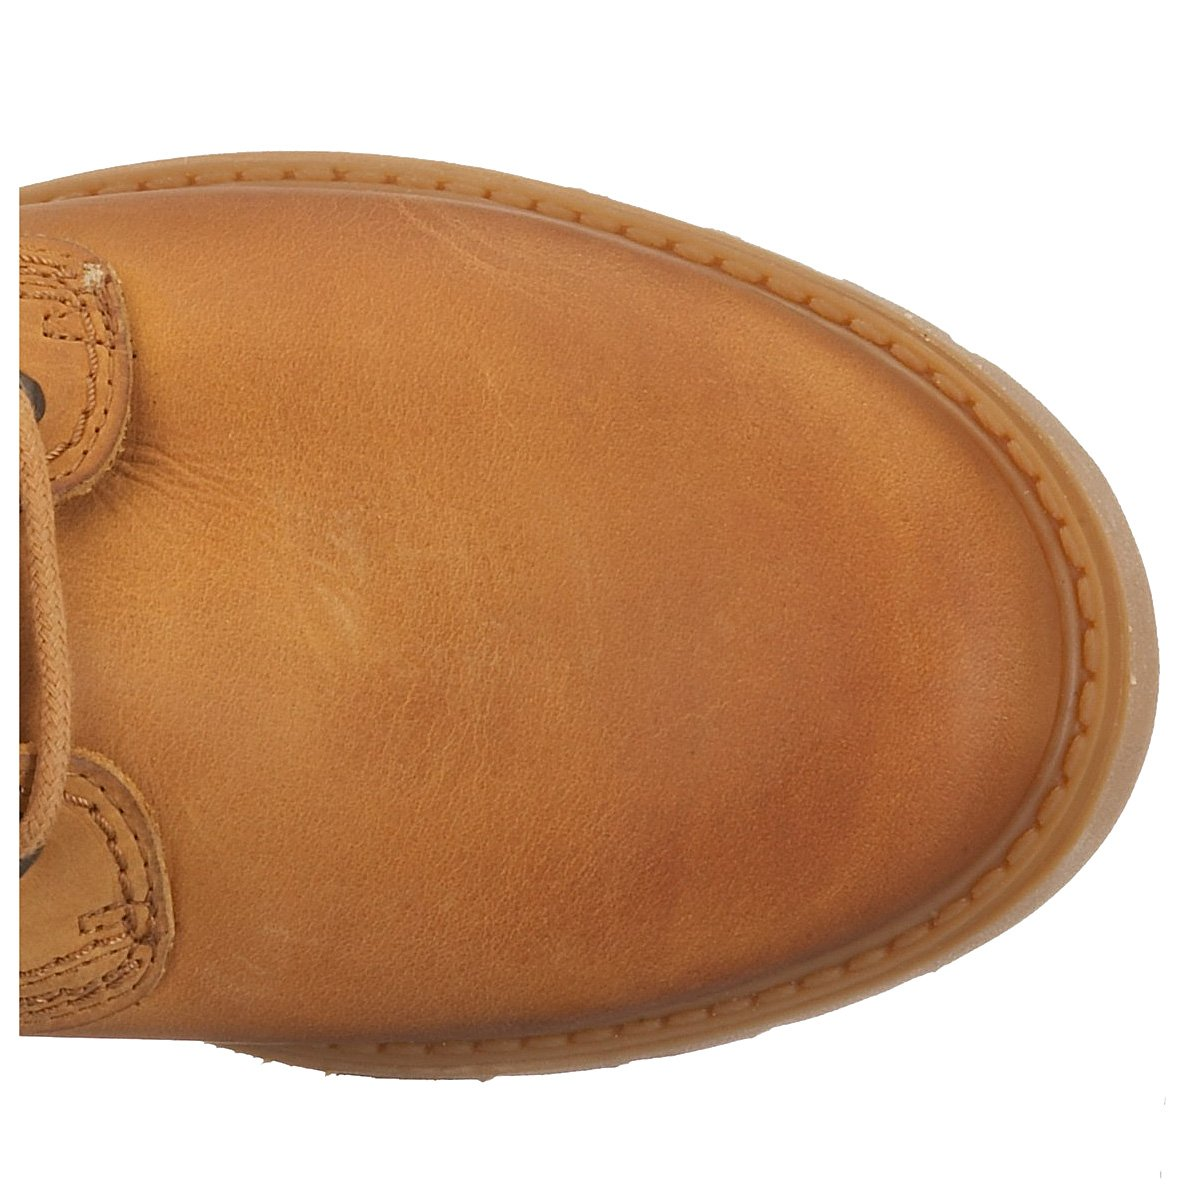 PANAMA JACK Panama 03 Classics Wool Herren Warm gefüttert Classics 03 Kurzschaft Stiefel & Stiefeletten Gelb (Vintage) e8acbd